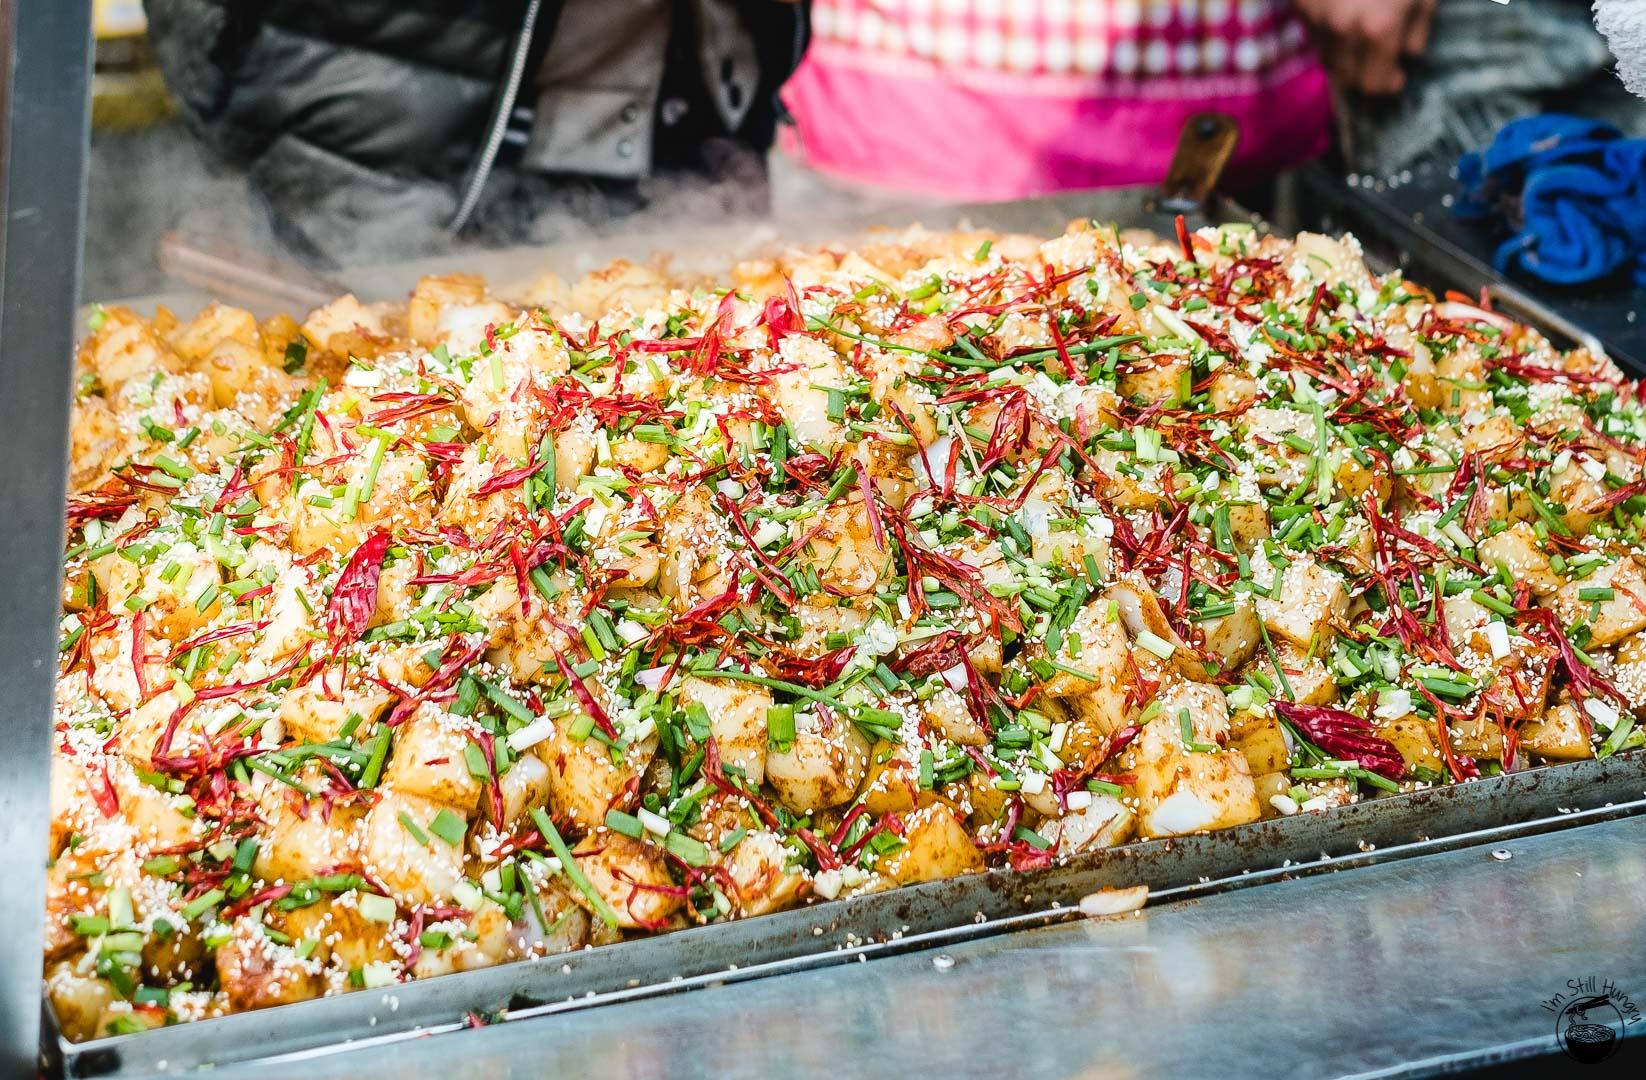 炒凉粉 (chao liang fen) Hui Min Jie Xi'an Muslim Street Food